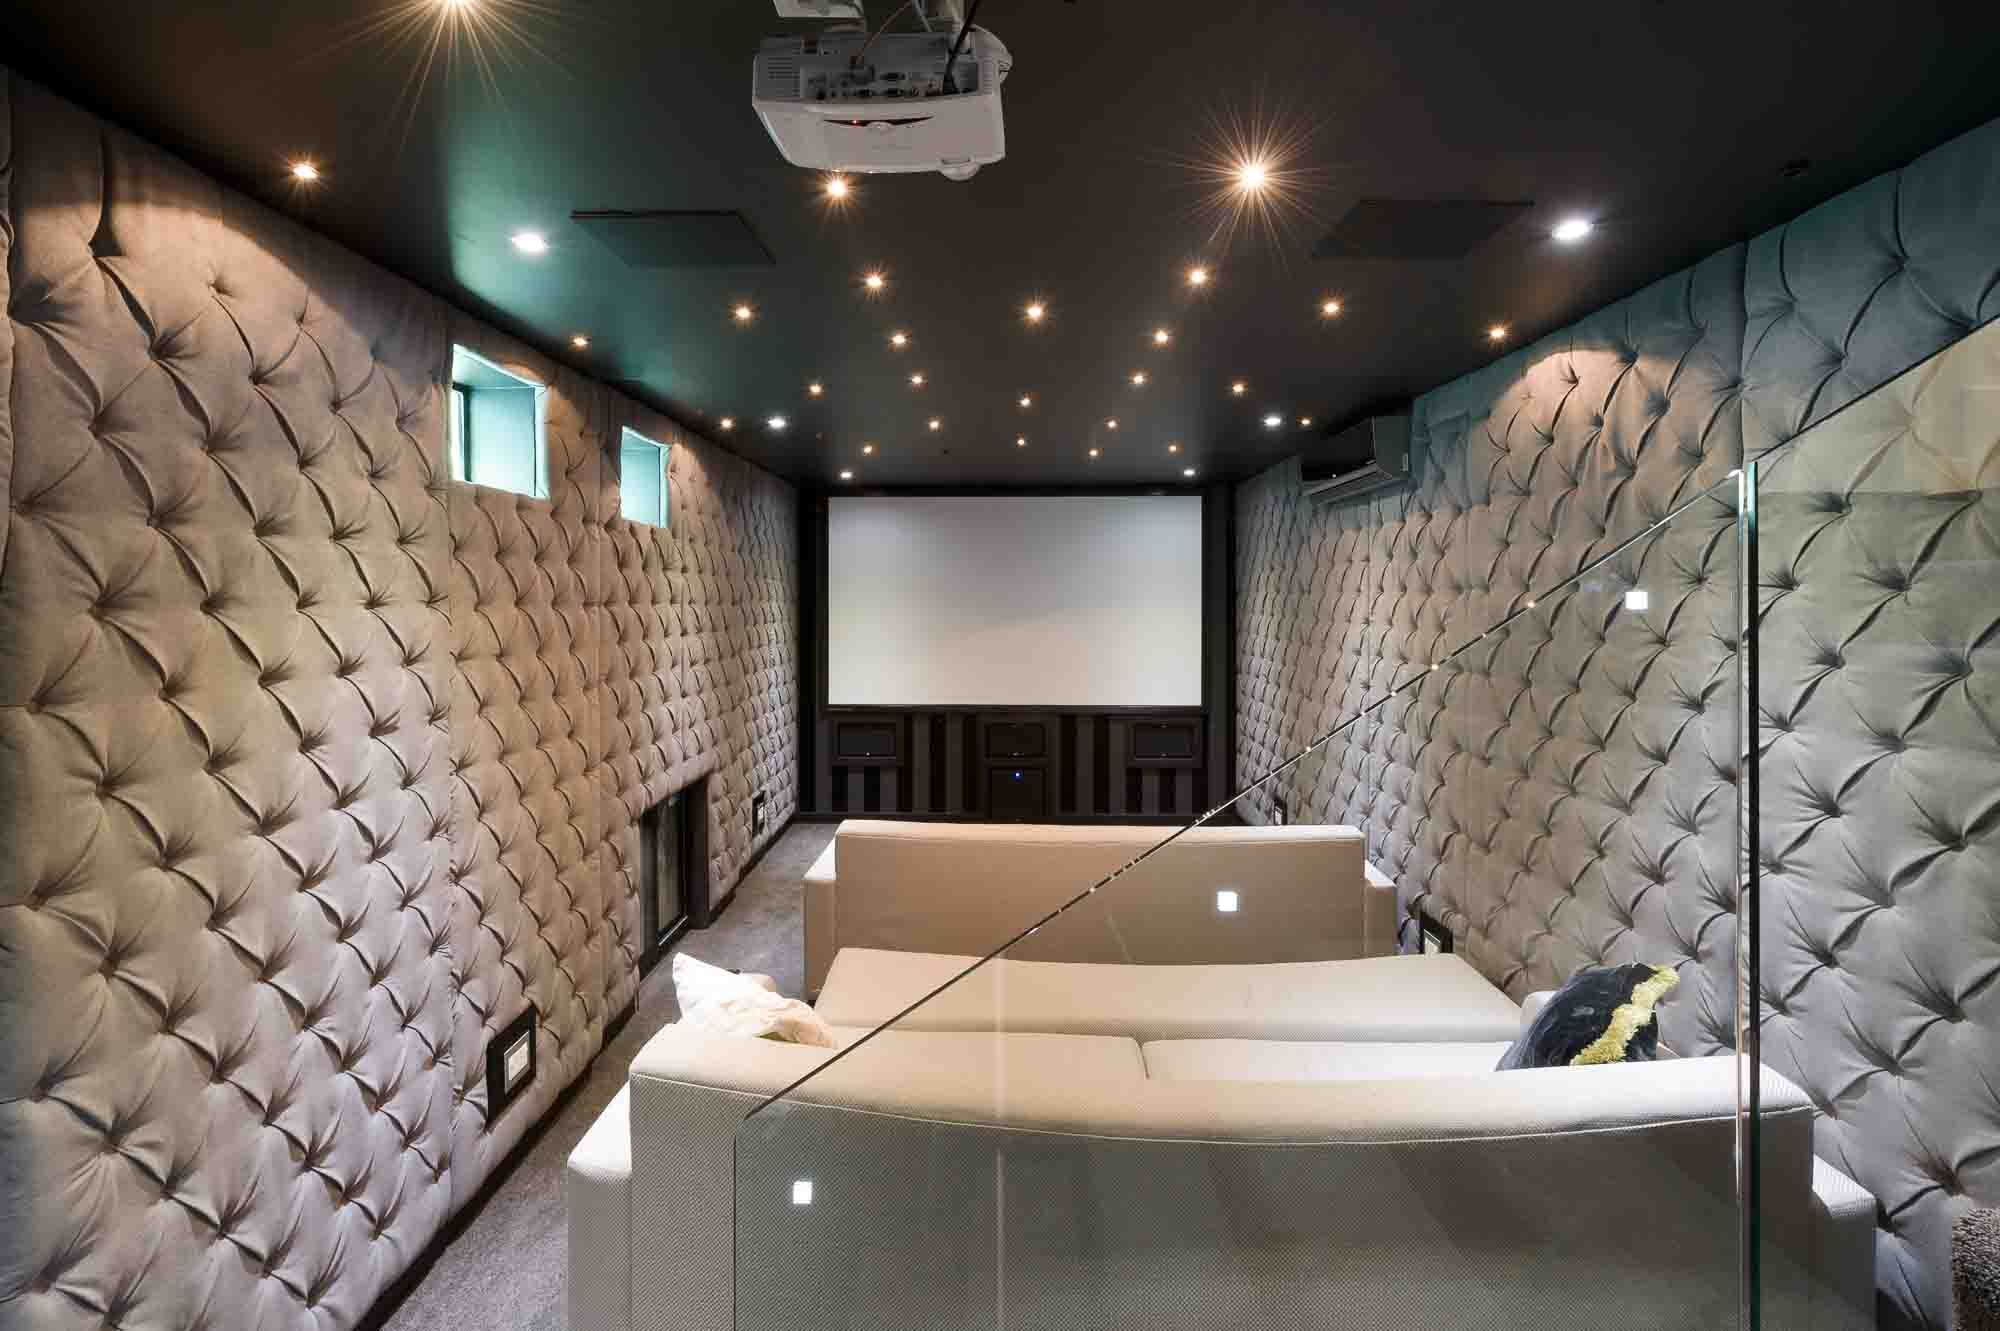 Soundproofing a room diy decor